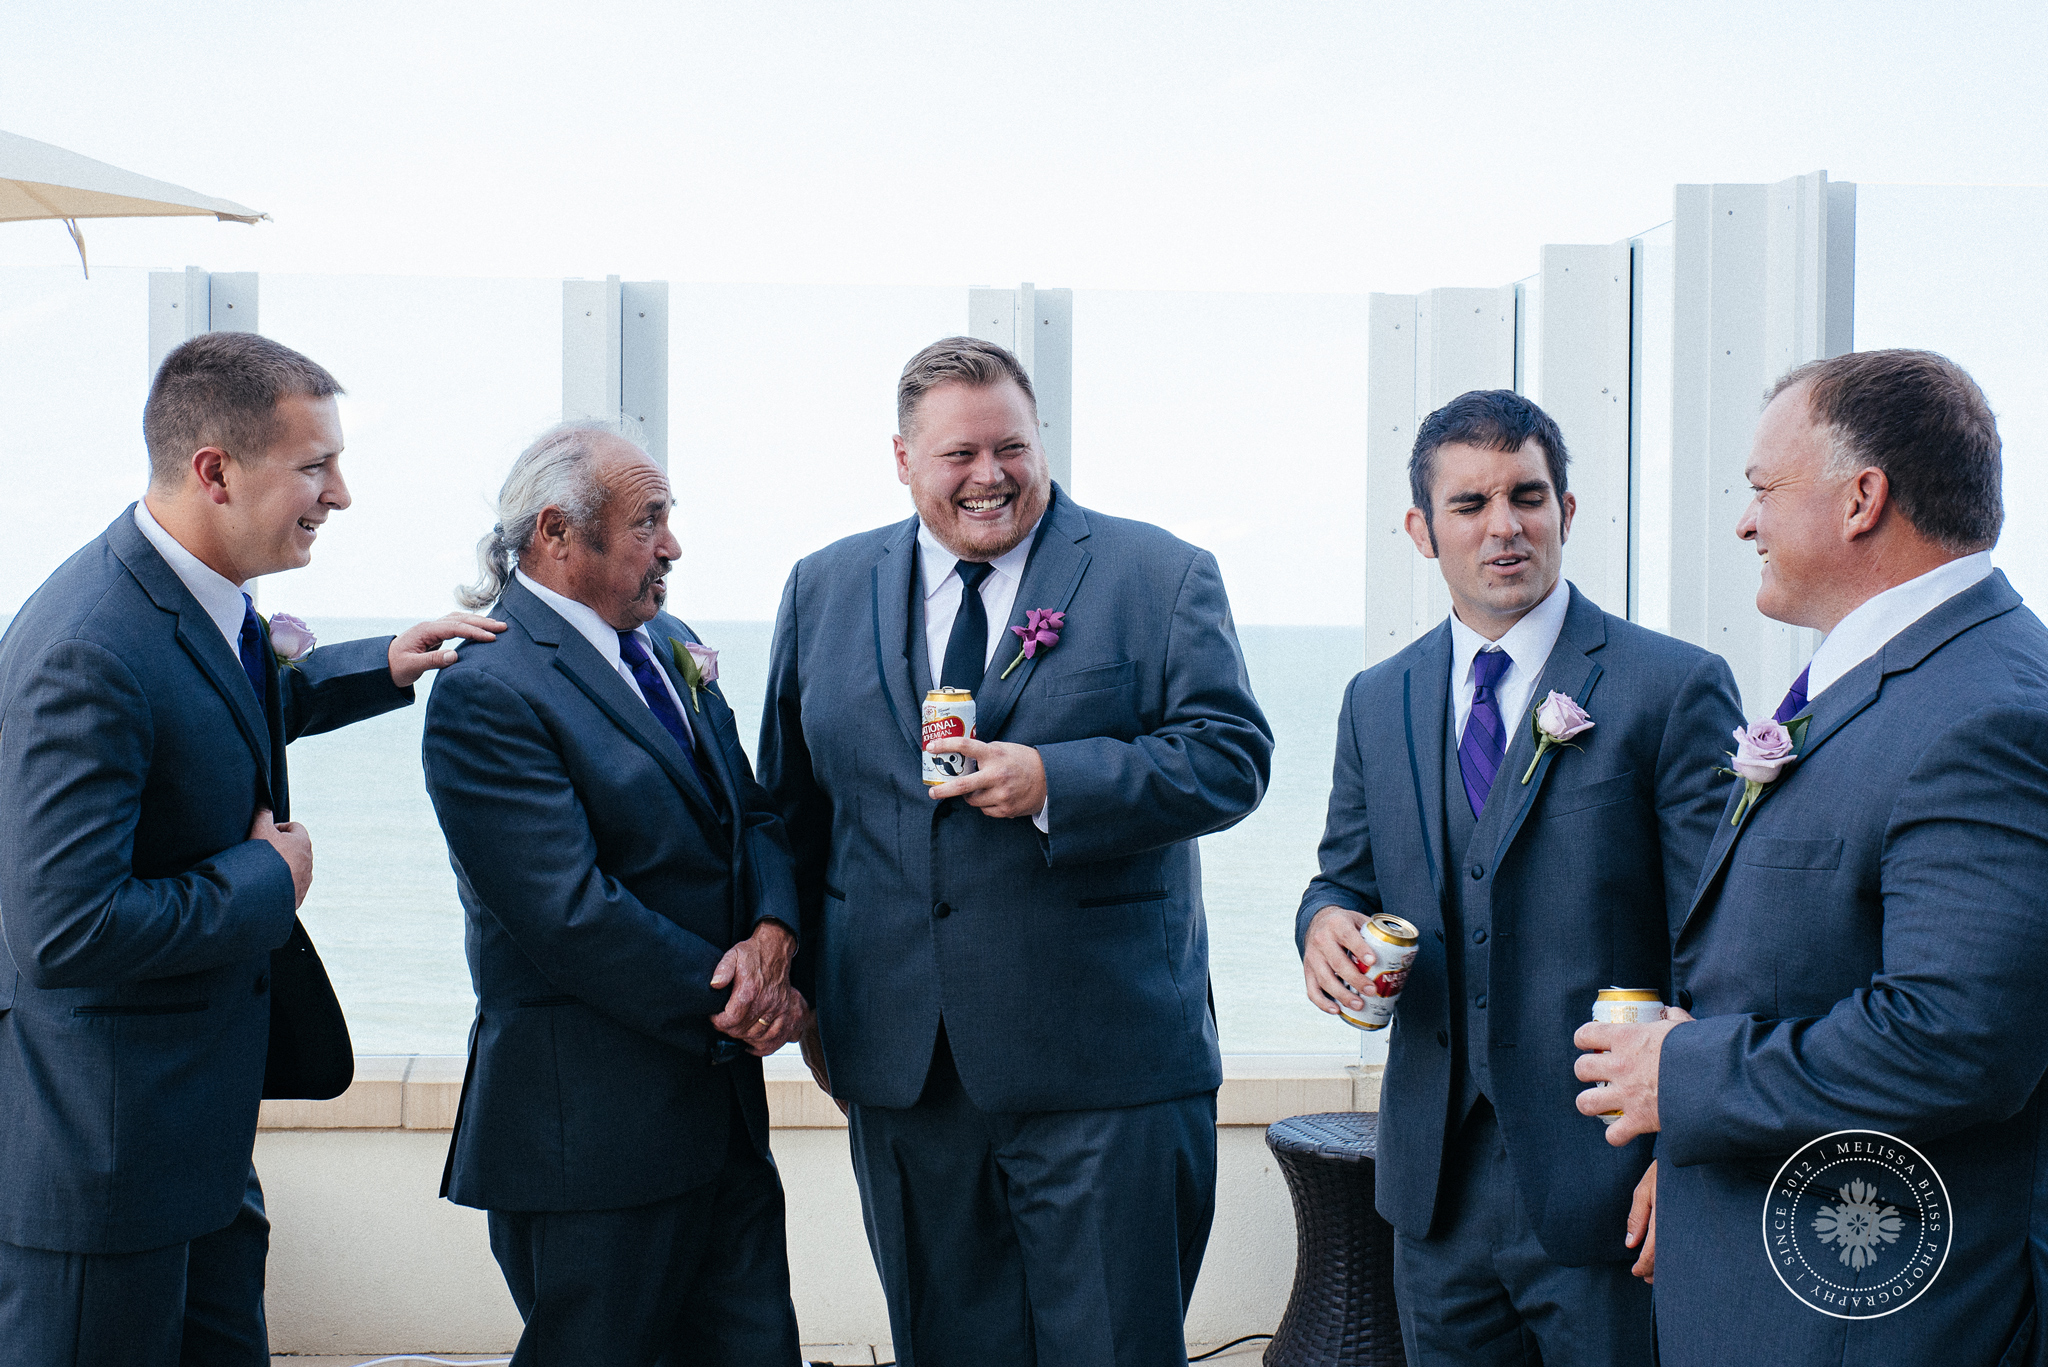 virginia-beach-professional-wedding-photographers-melissa-bliss-photography-oceanaire-resort-wedding